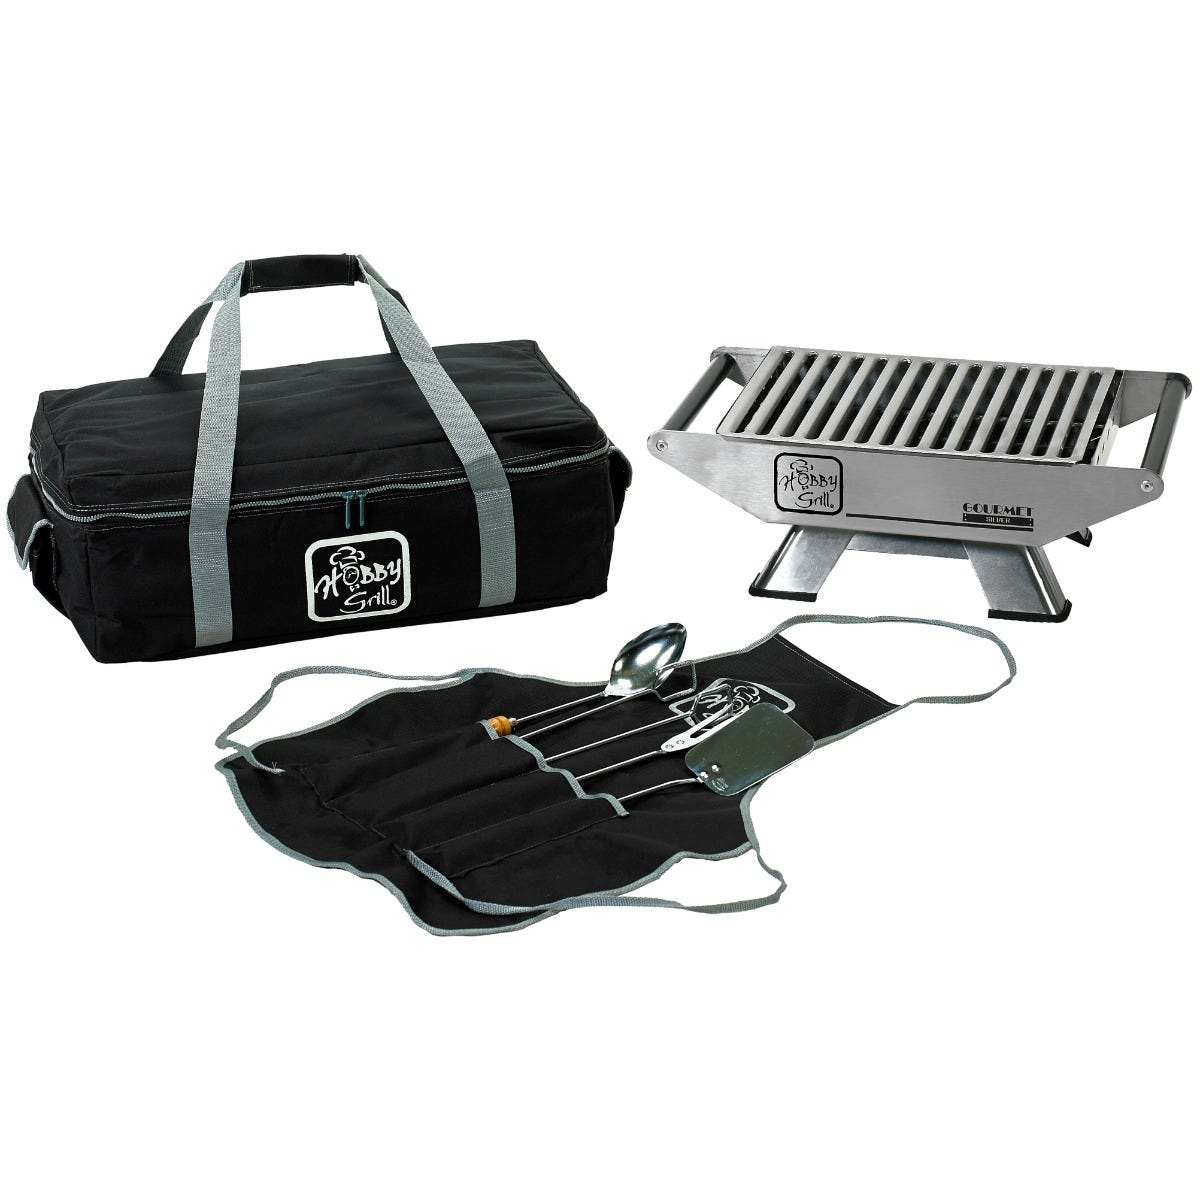 Kit de BBQ portátil Hobby Grill®